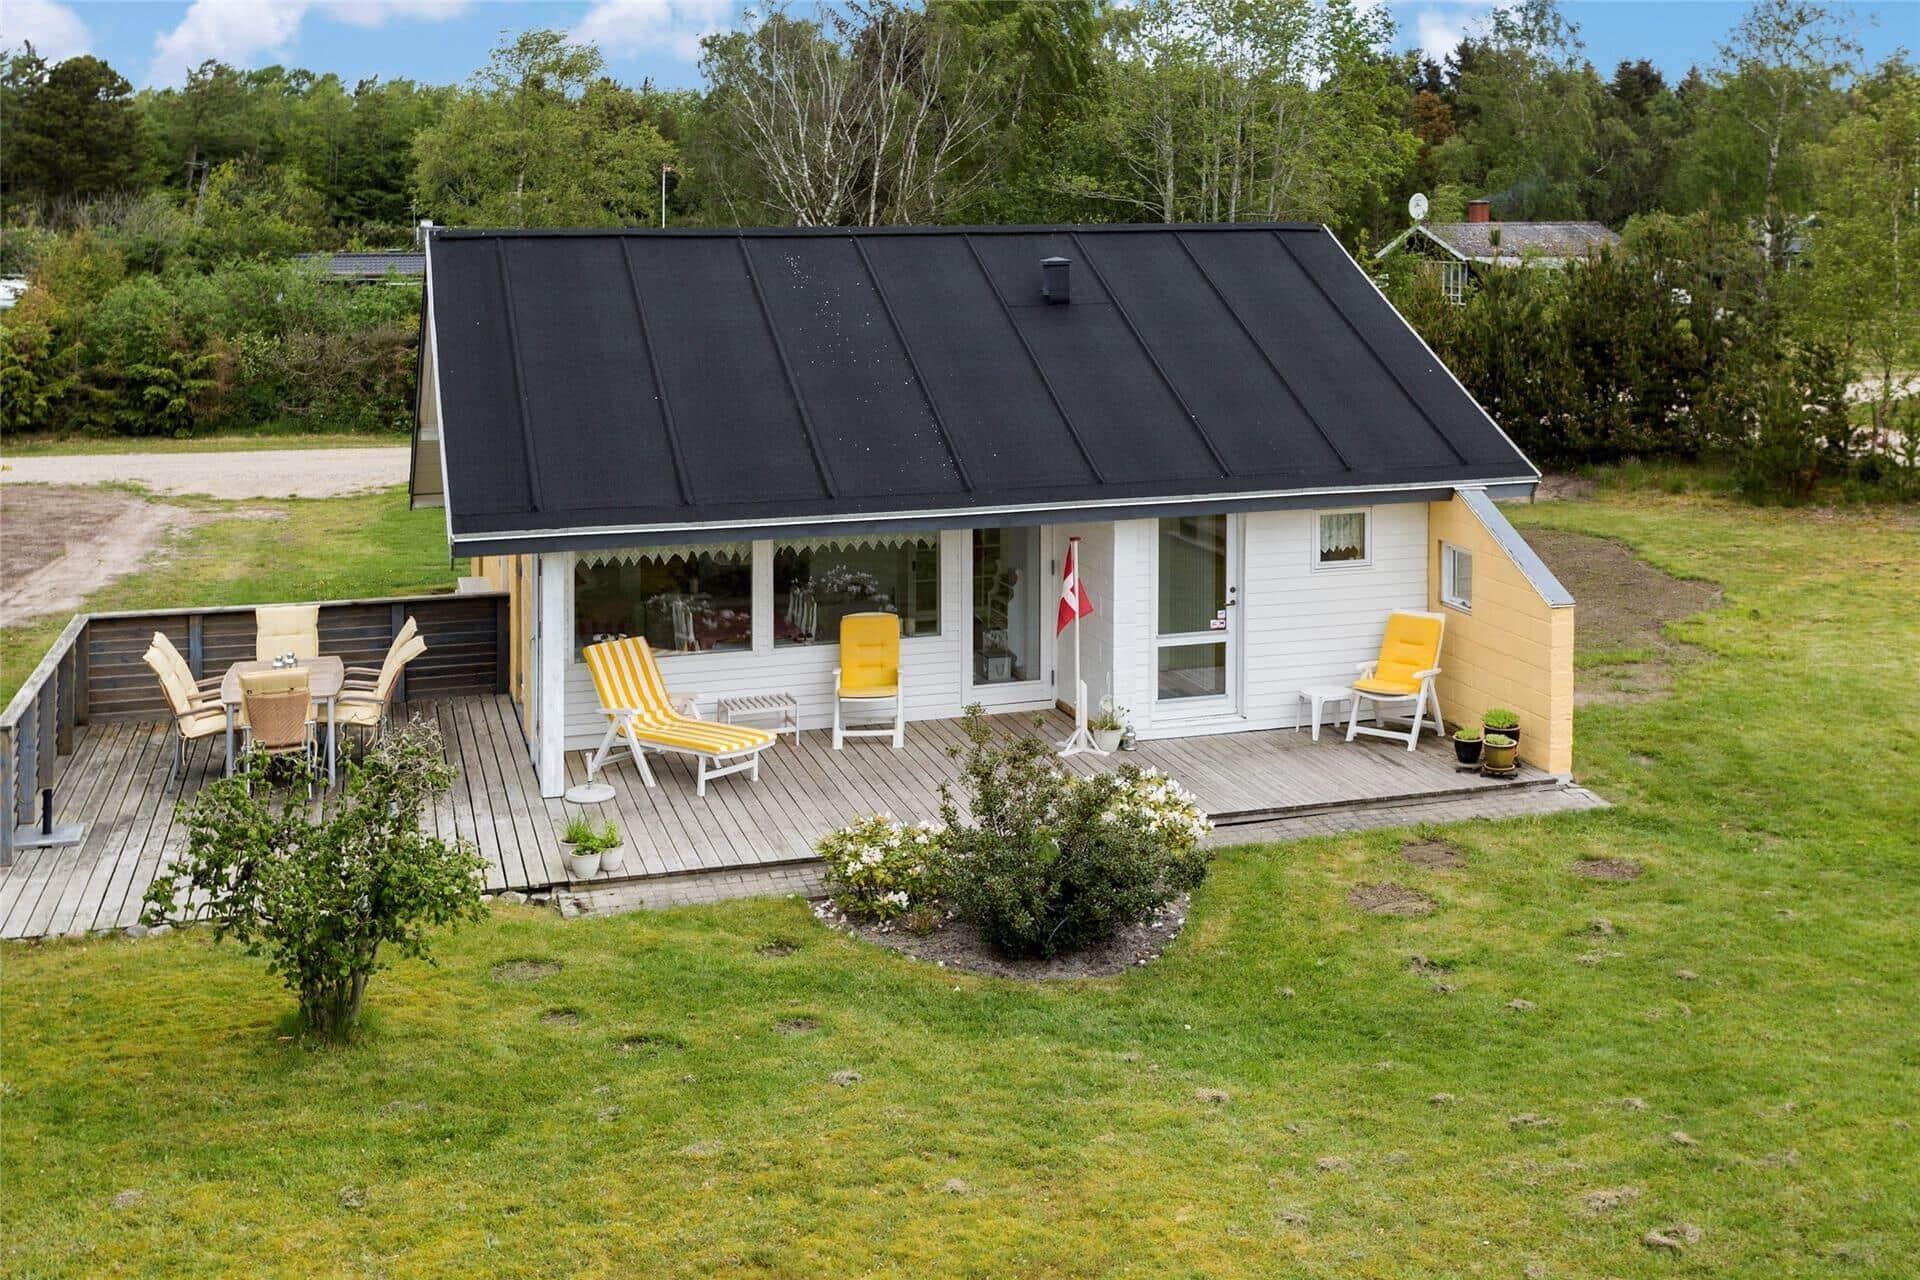 Bild 1-401 Ferienhaus HA260, Lyngtoften 13, DK - 9370 Hals